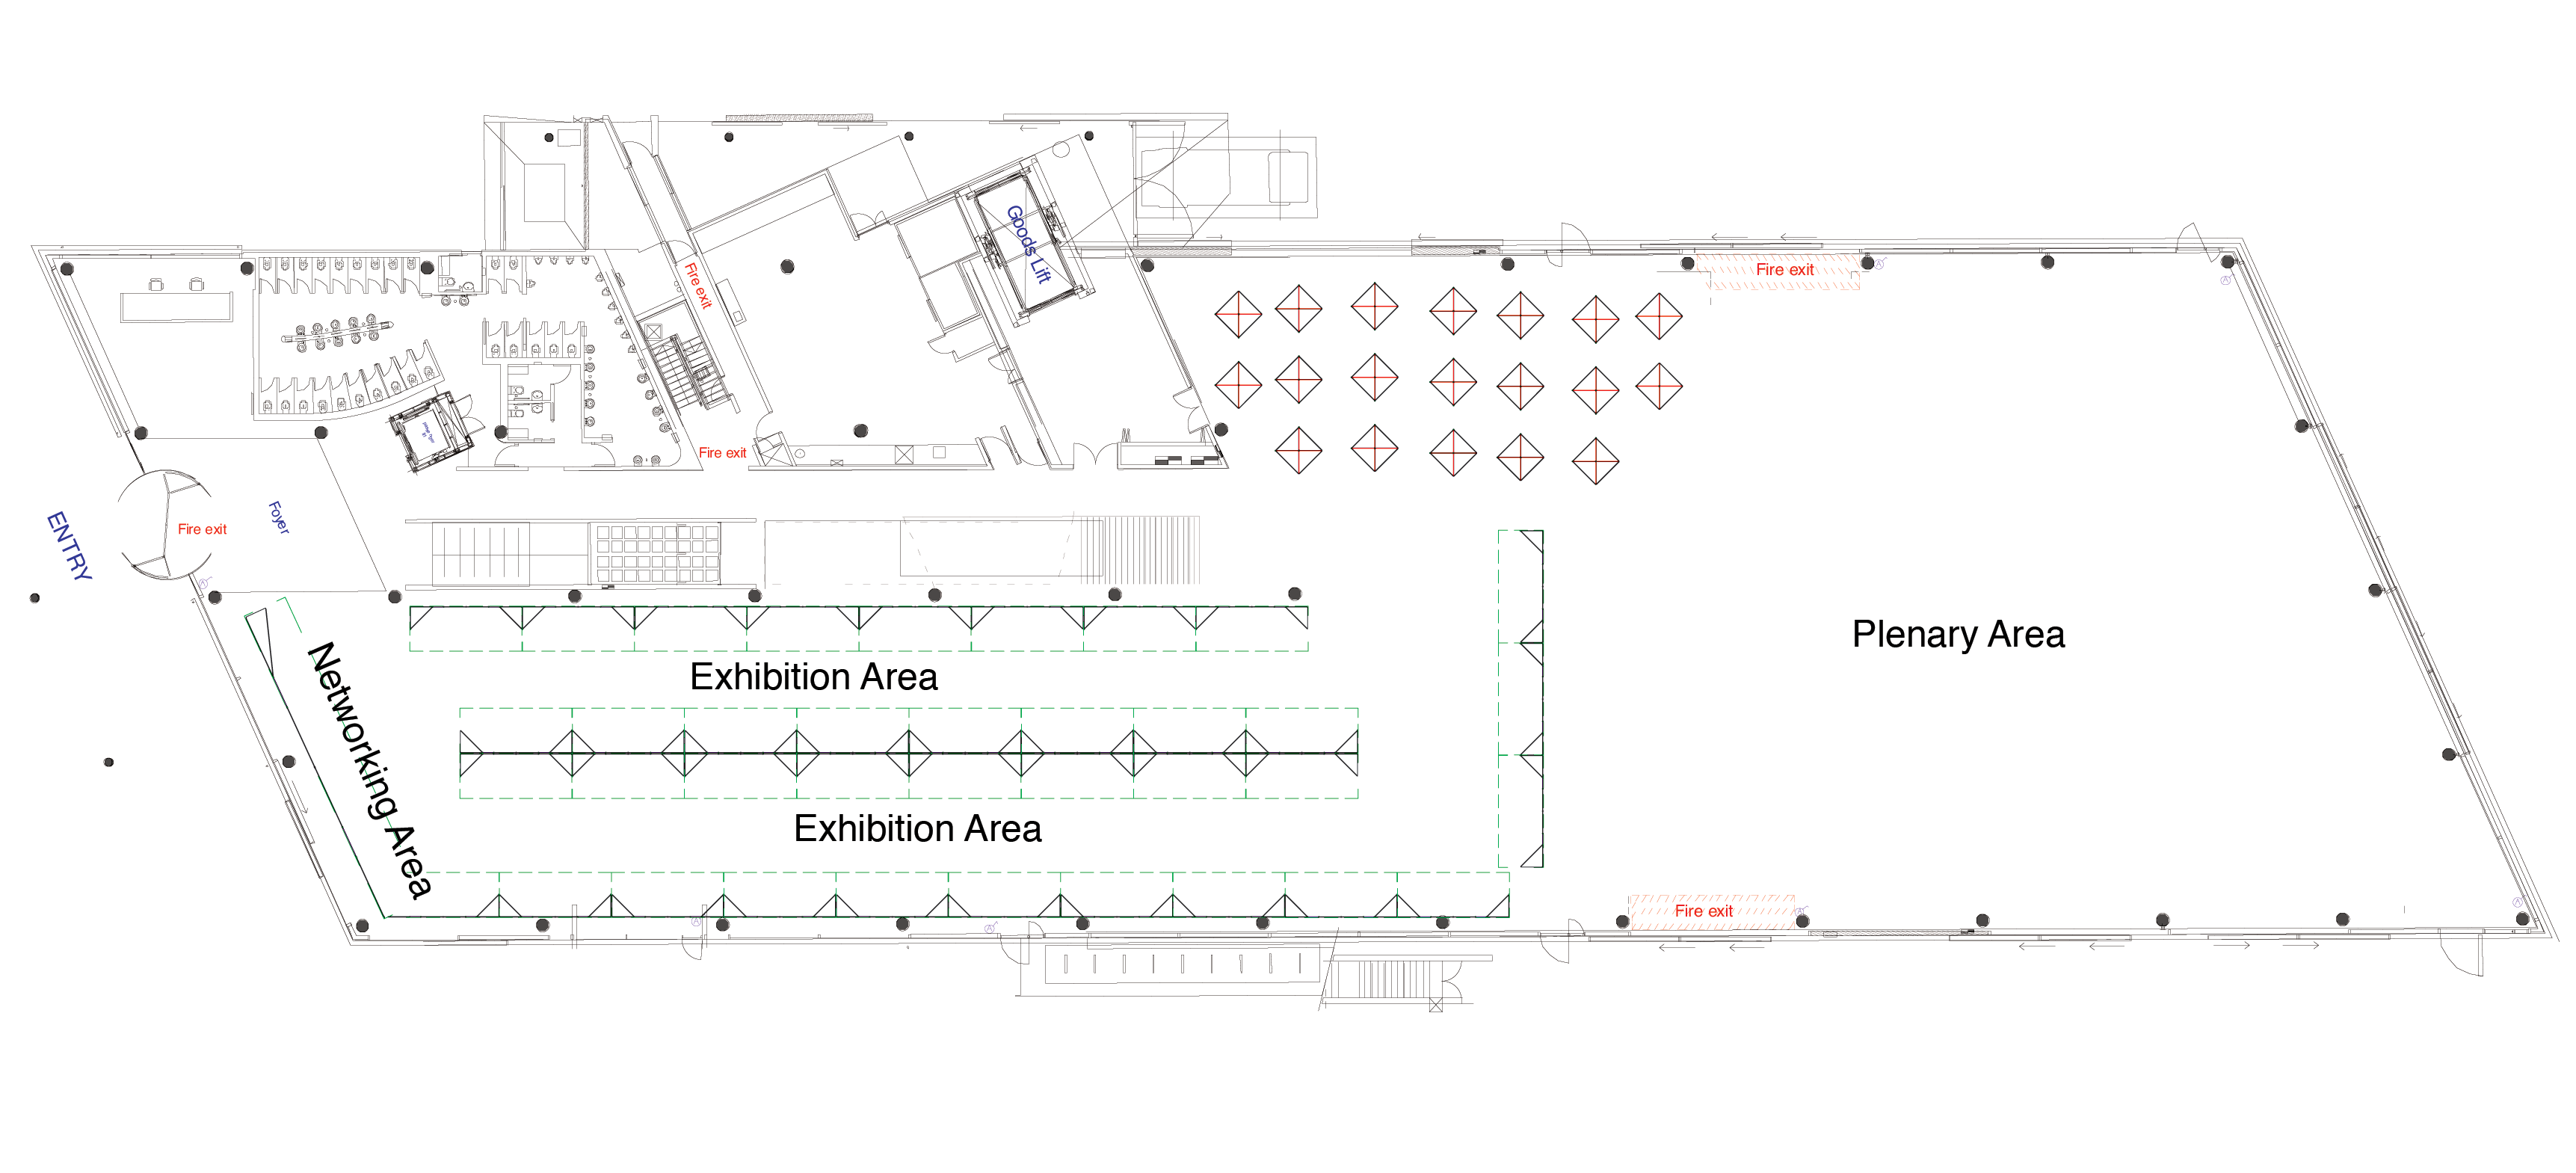 Network floorplan